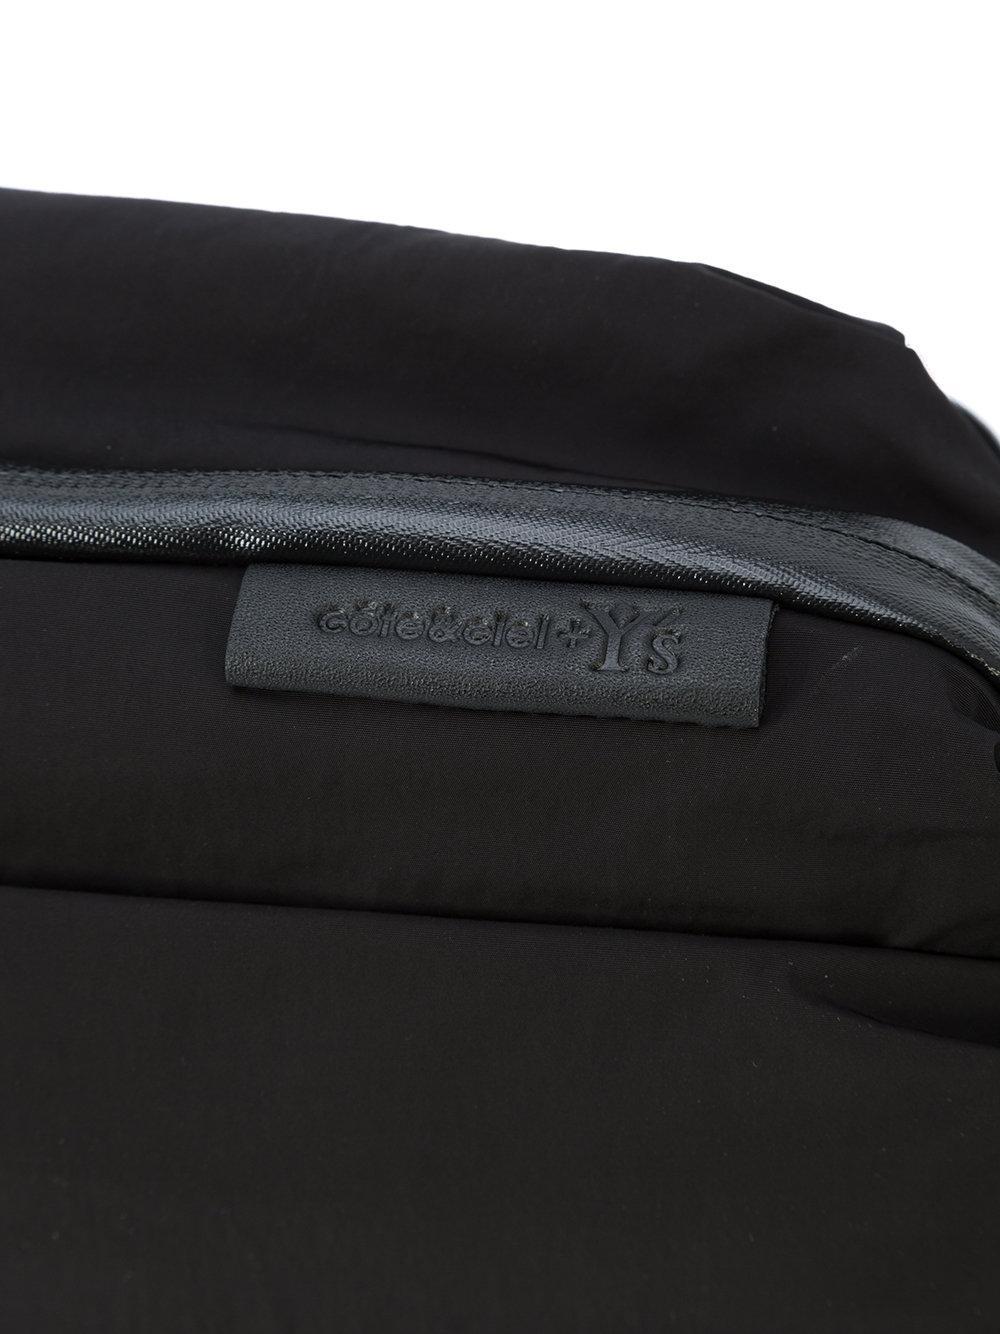 waist belted mini bag - Black Yohji Yamamoto Buy Cheap Get To Buy Authentic Really Online Hard Wearing xRFfoh